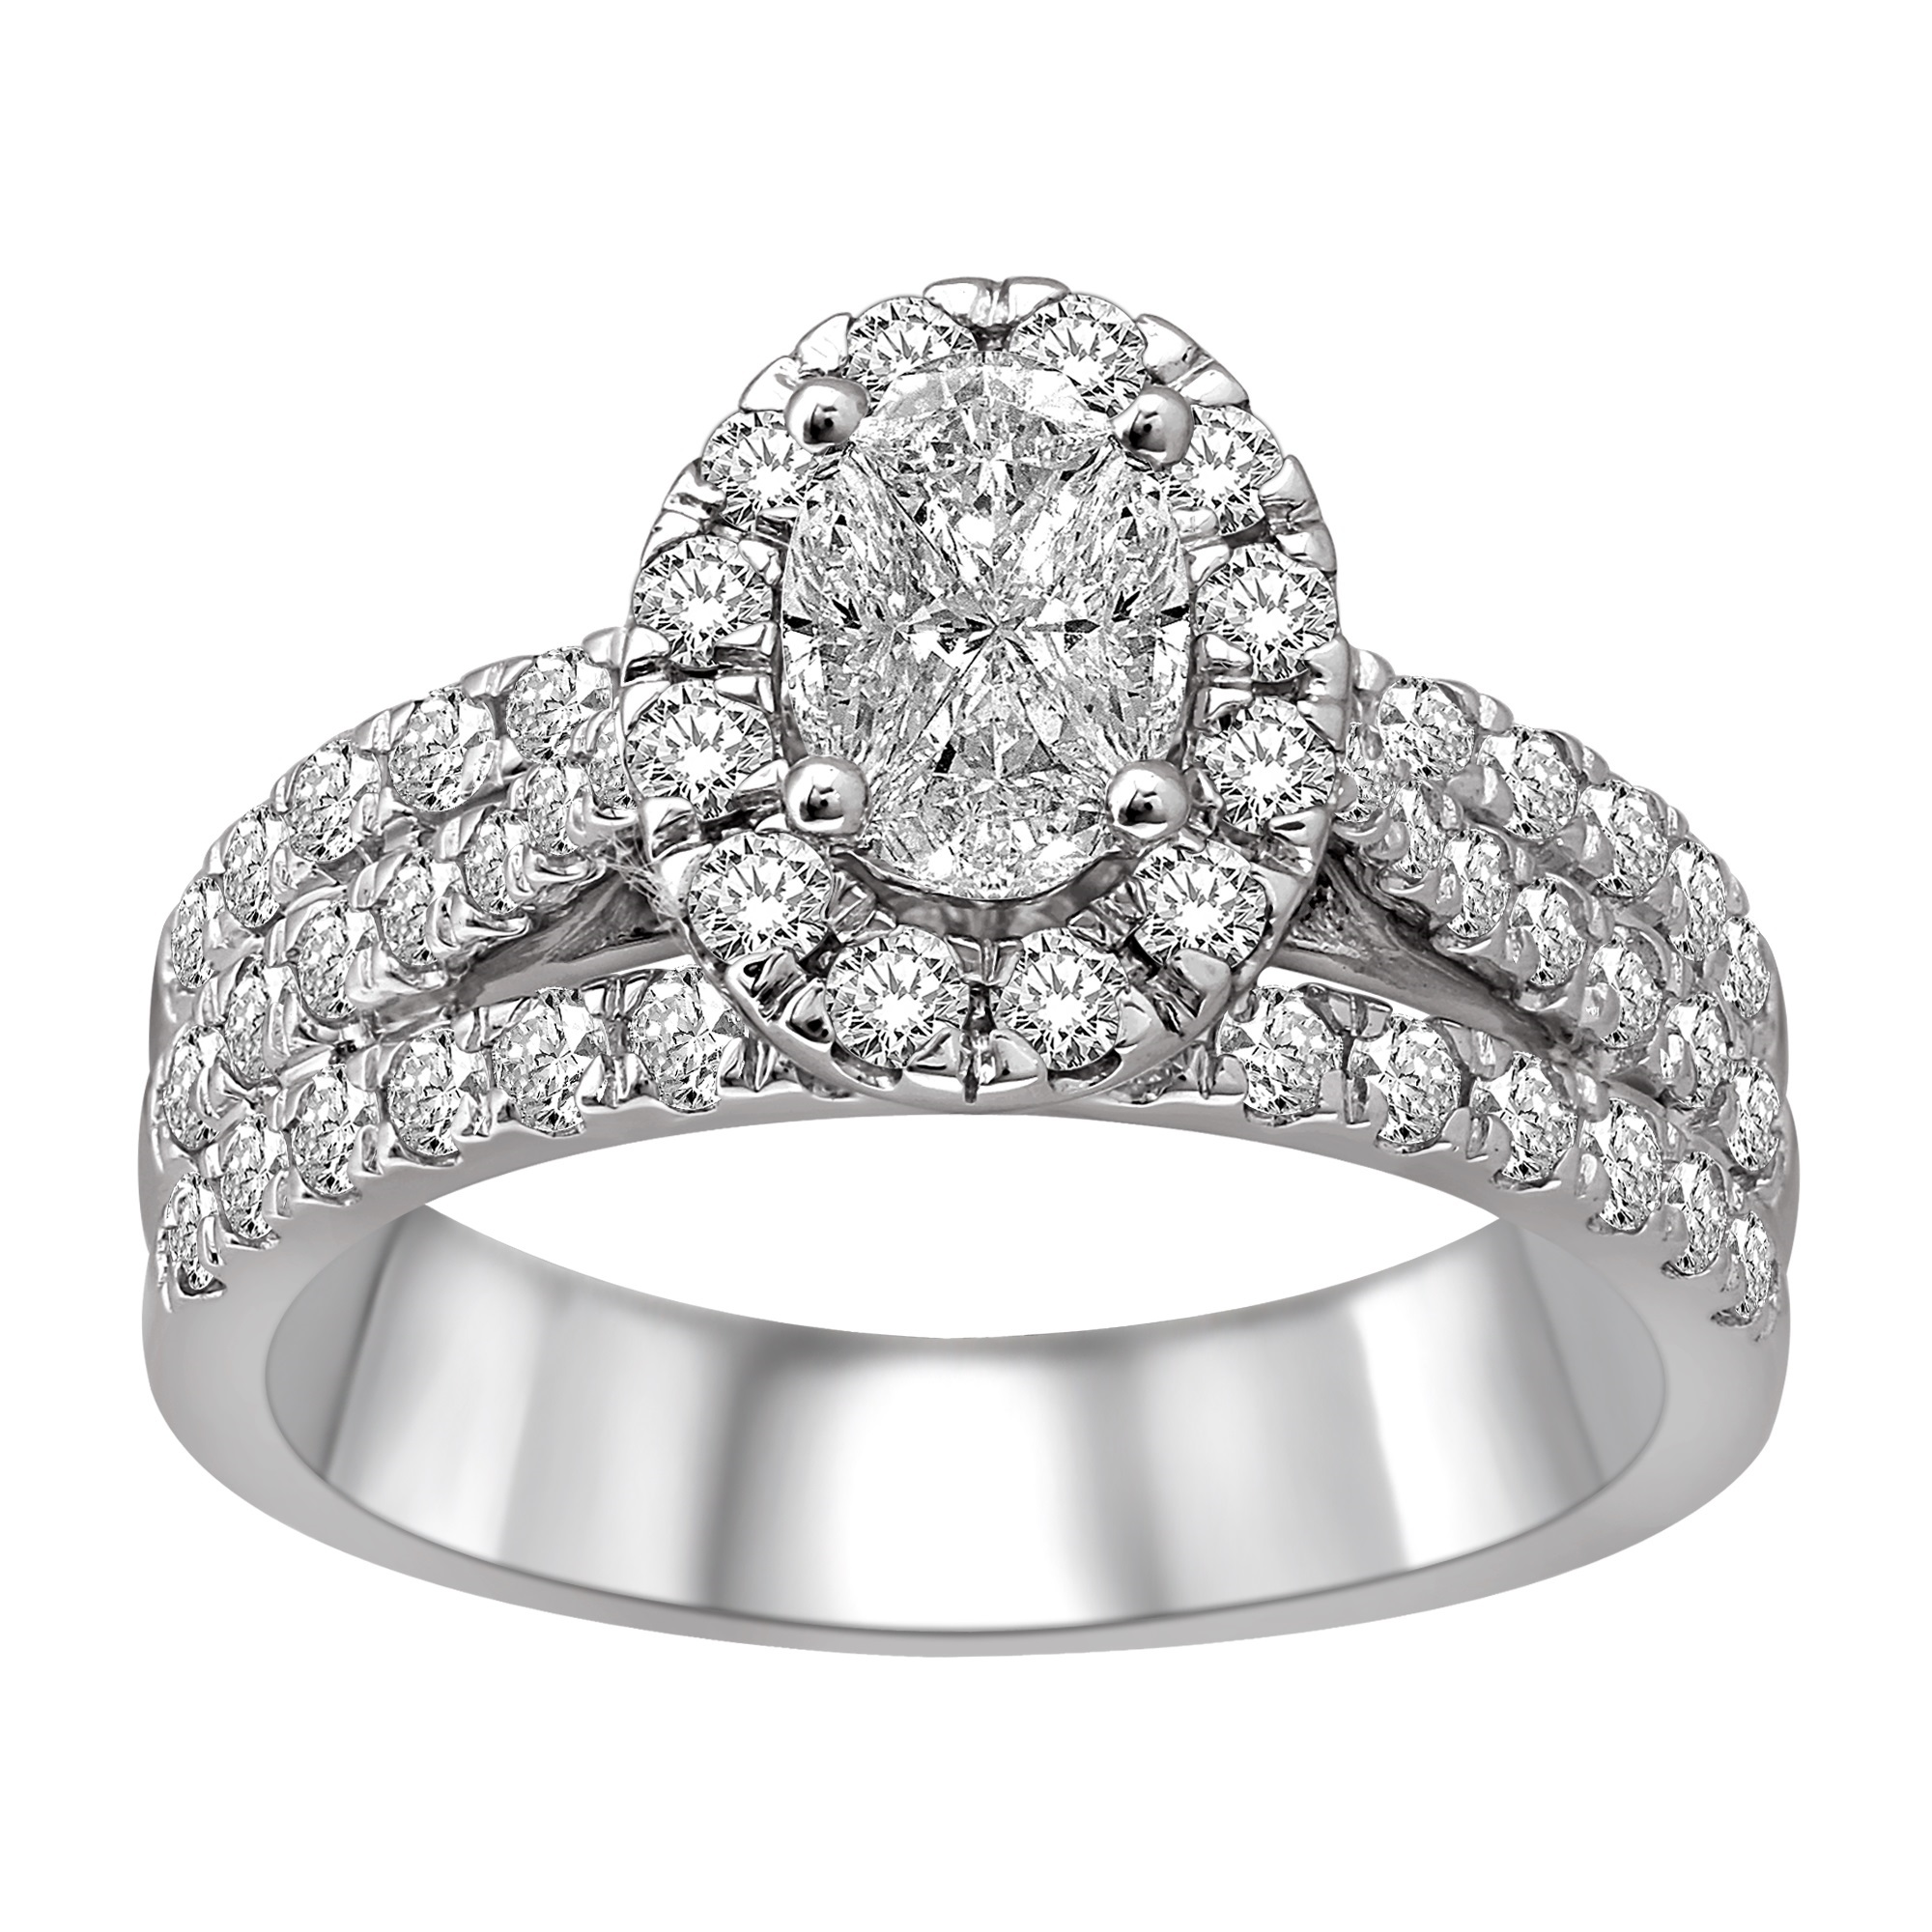 Ring for woman - 14K white Gold & Diamonds T.W. 1.50 Carat